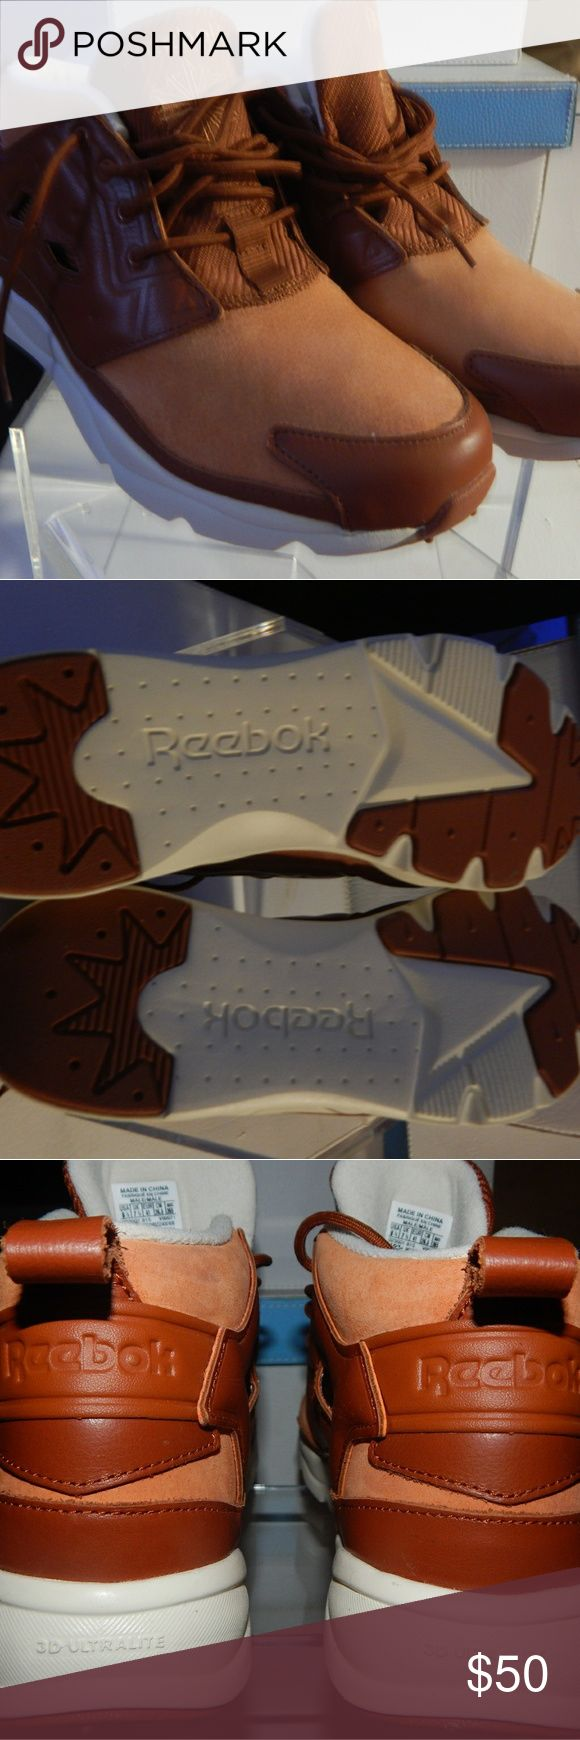 Brand New Reebok Casual Sneaker Boots New Men Reebok Sneaker/Casual Boot Reebok Shoes Sneakers